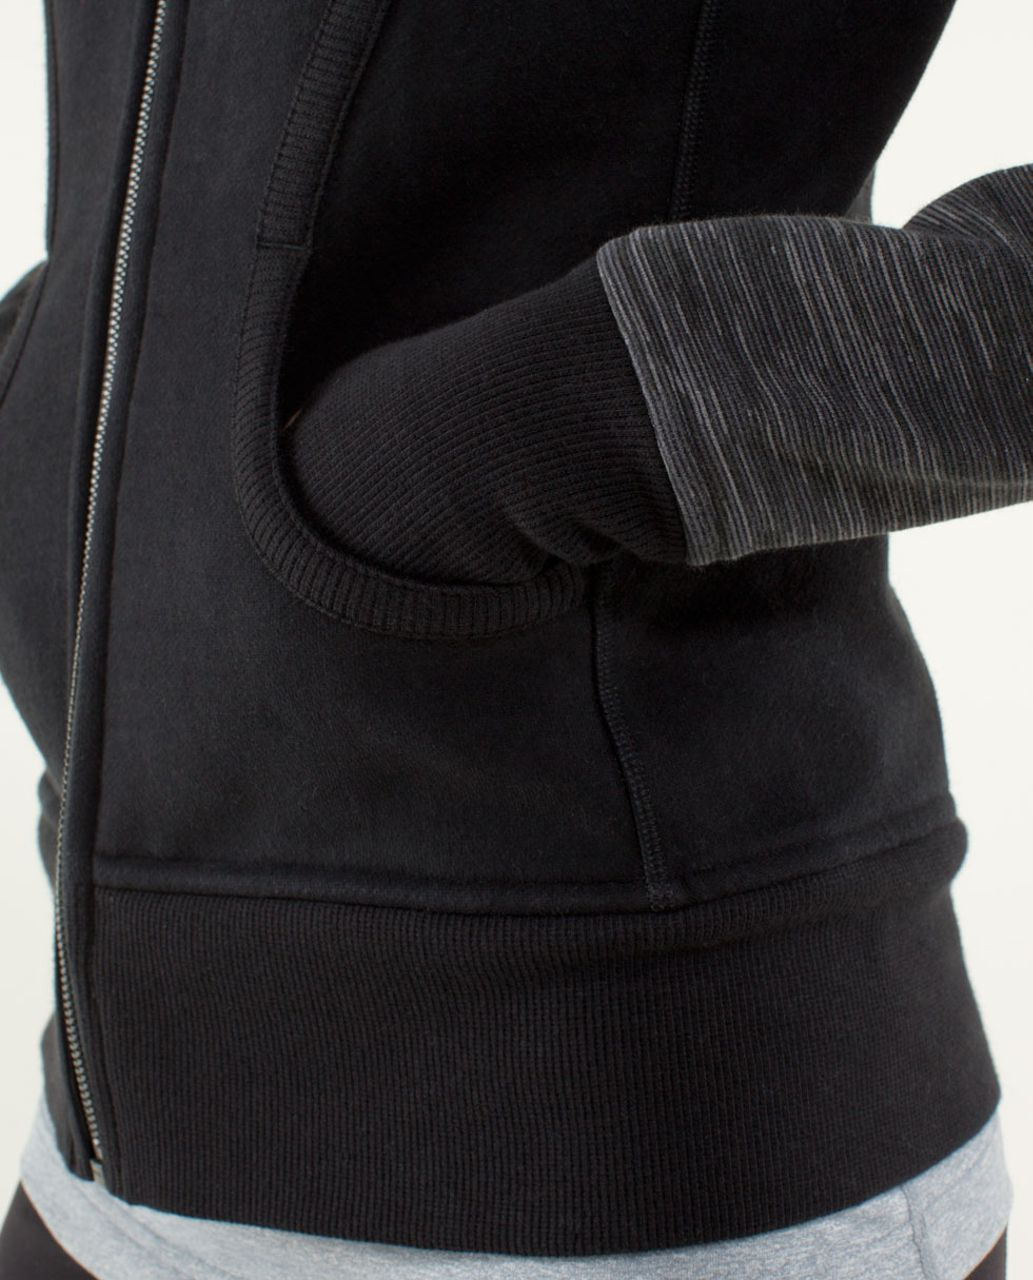 Lululemon Scuba Hoodie *Stretch (Lined Hood) - Black / Wee Are From Space Printed September Black